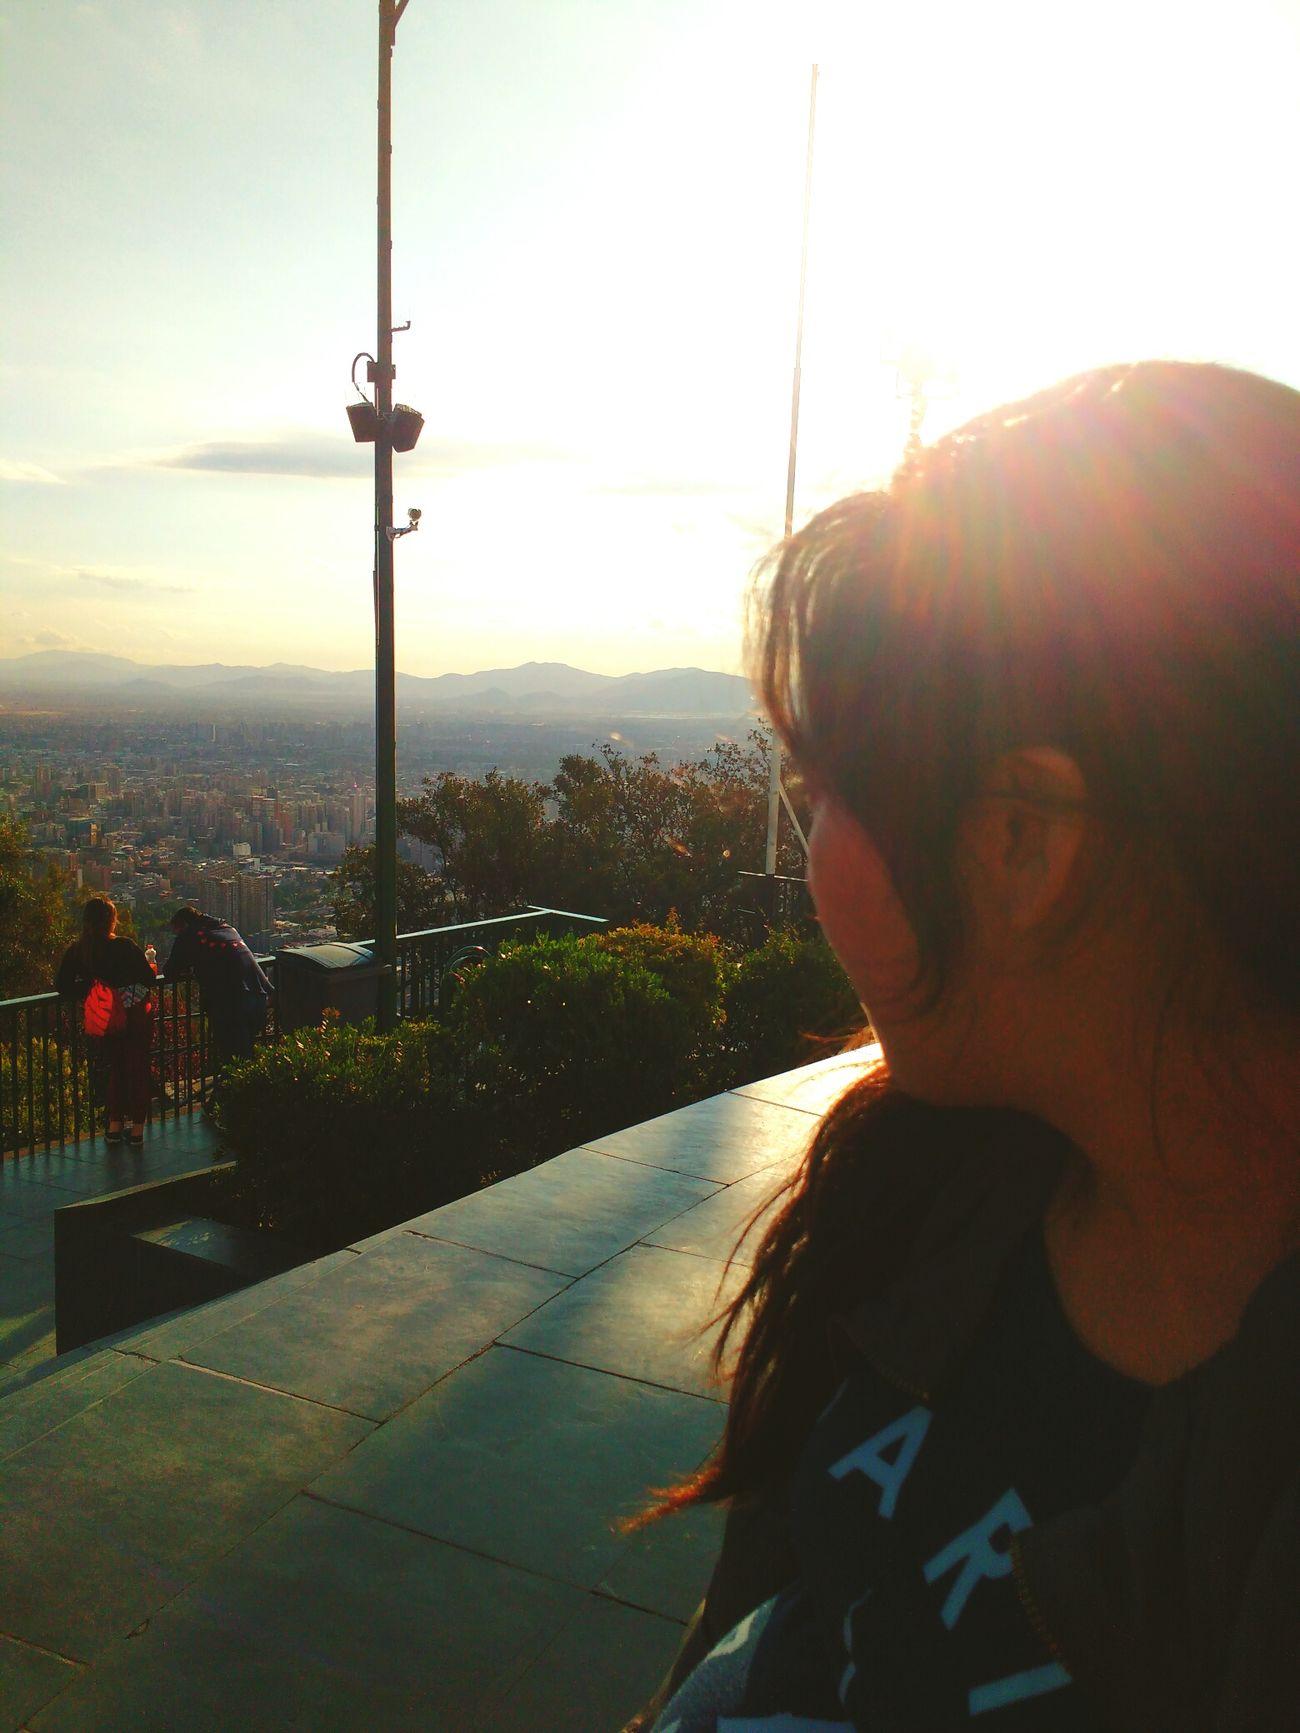 Sunlight Pepole Day